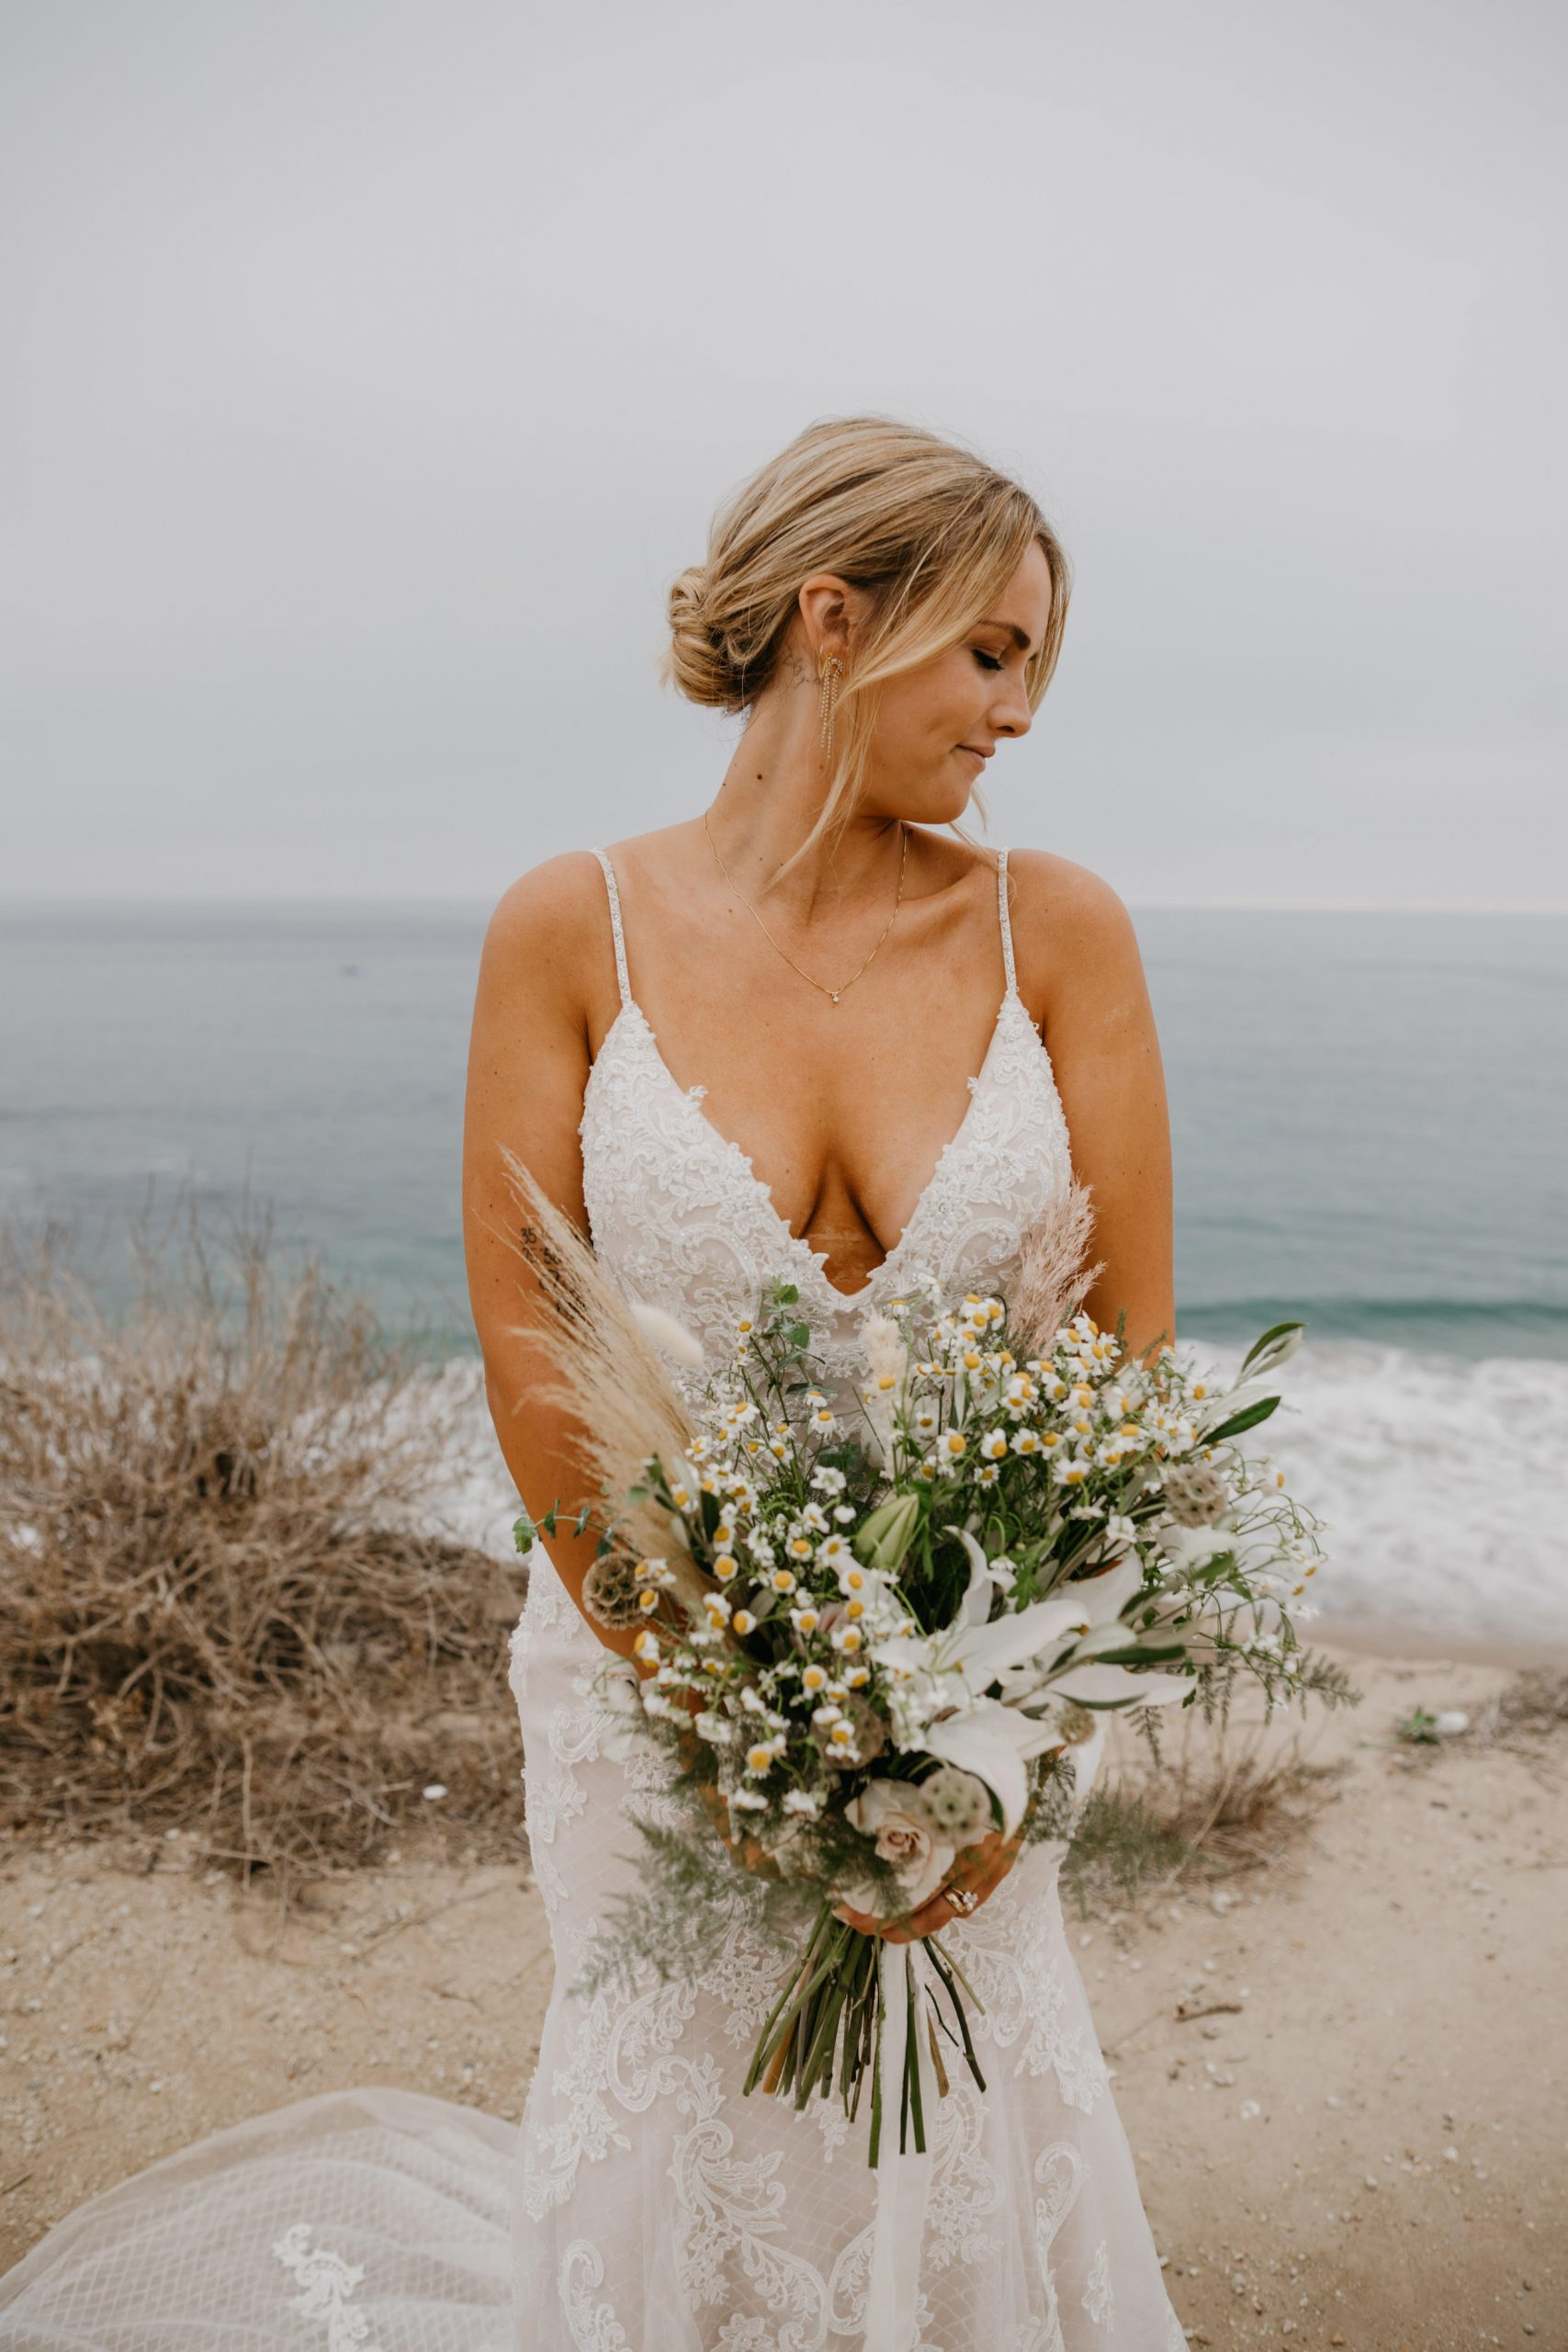 Bride Portrait in Crystal Cove State Park Wedding in Laguna Beach, image by Fatima Elreda Photo